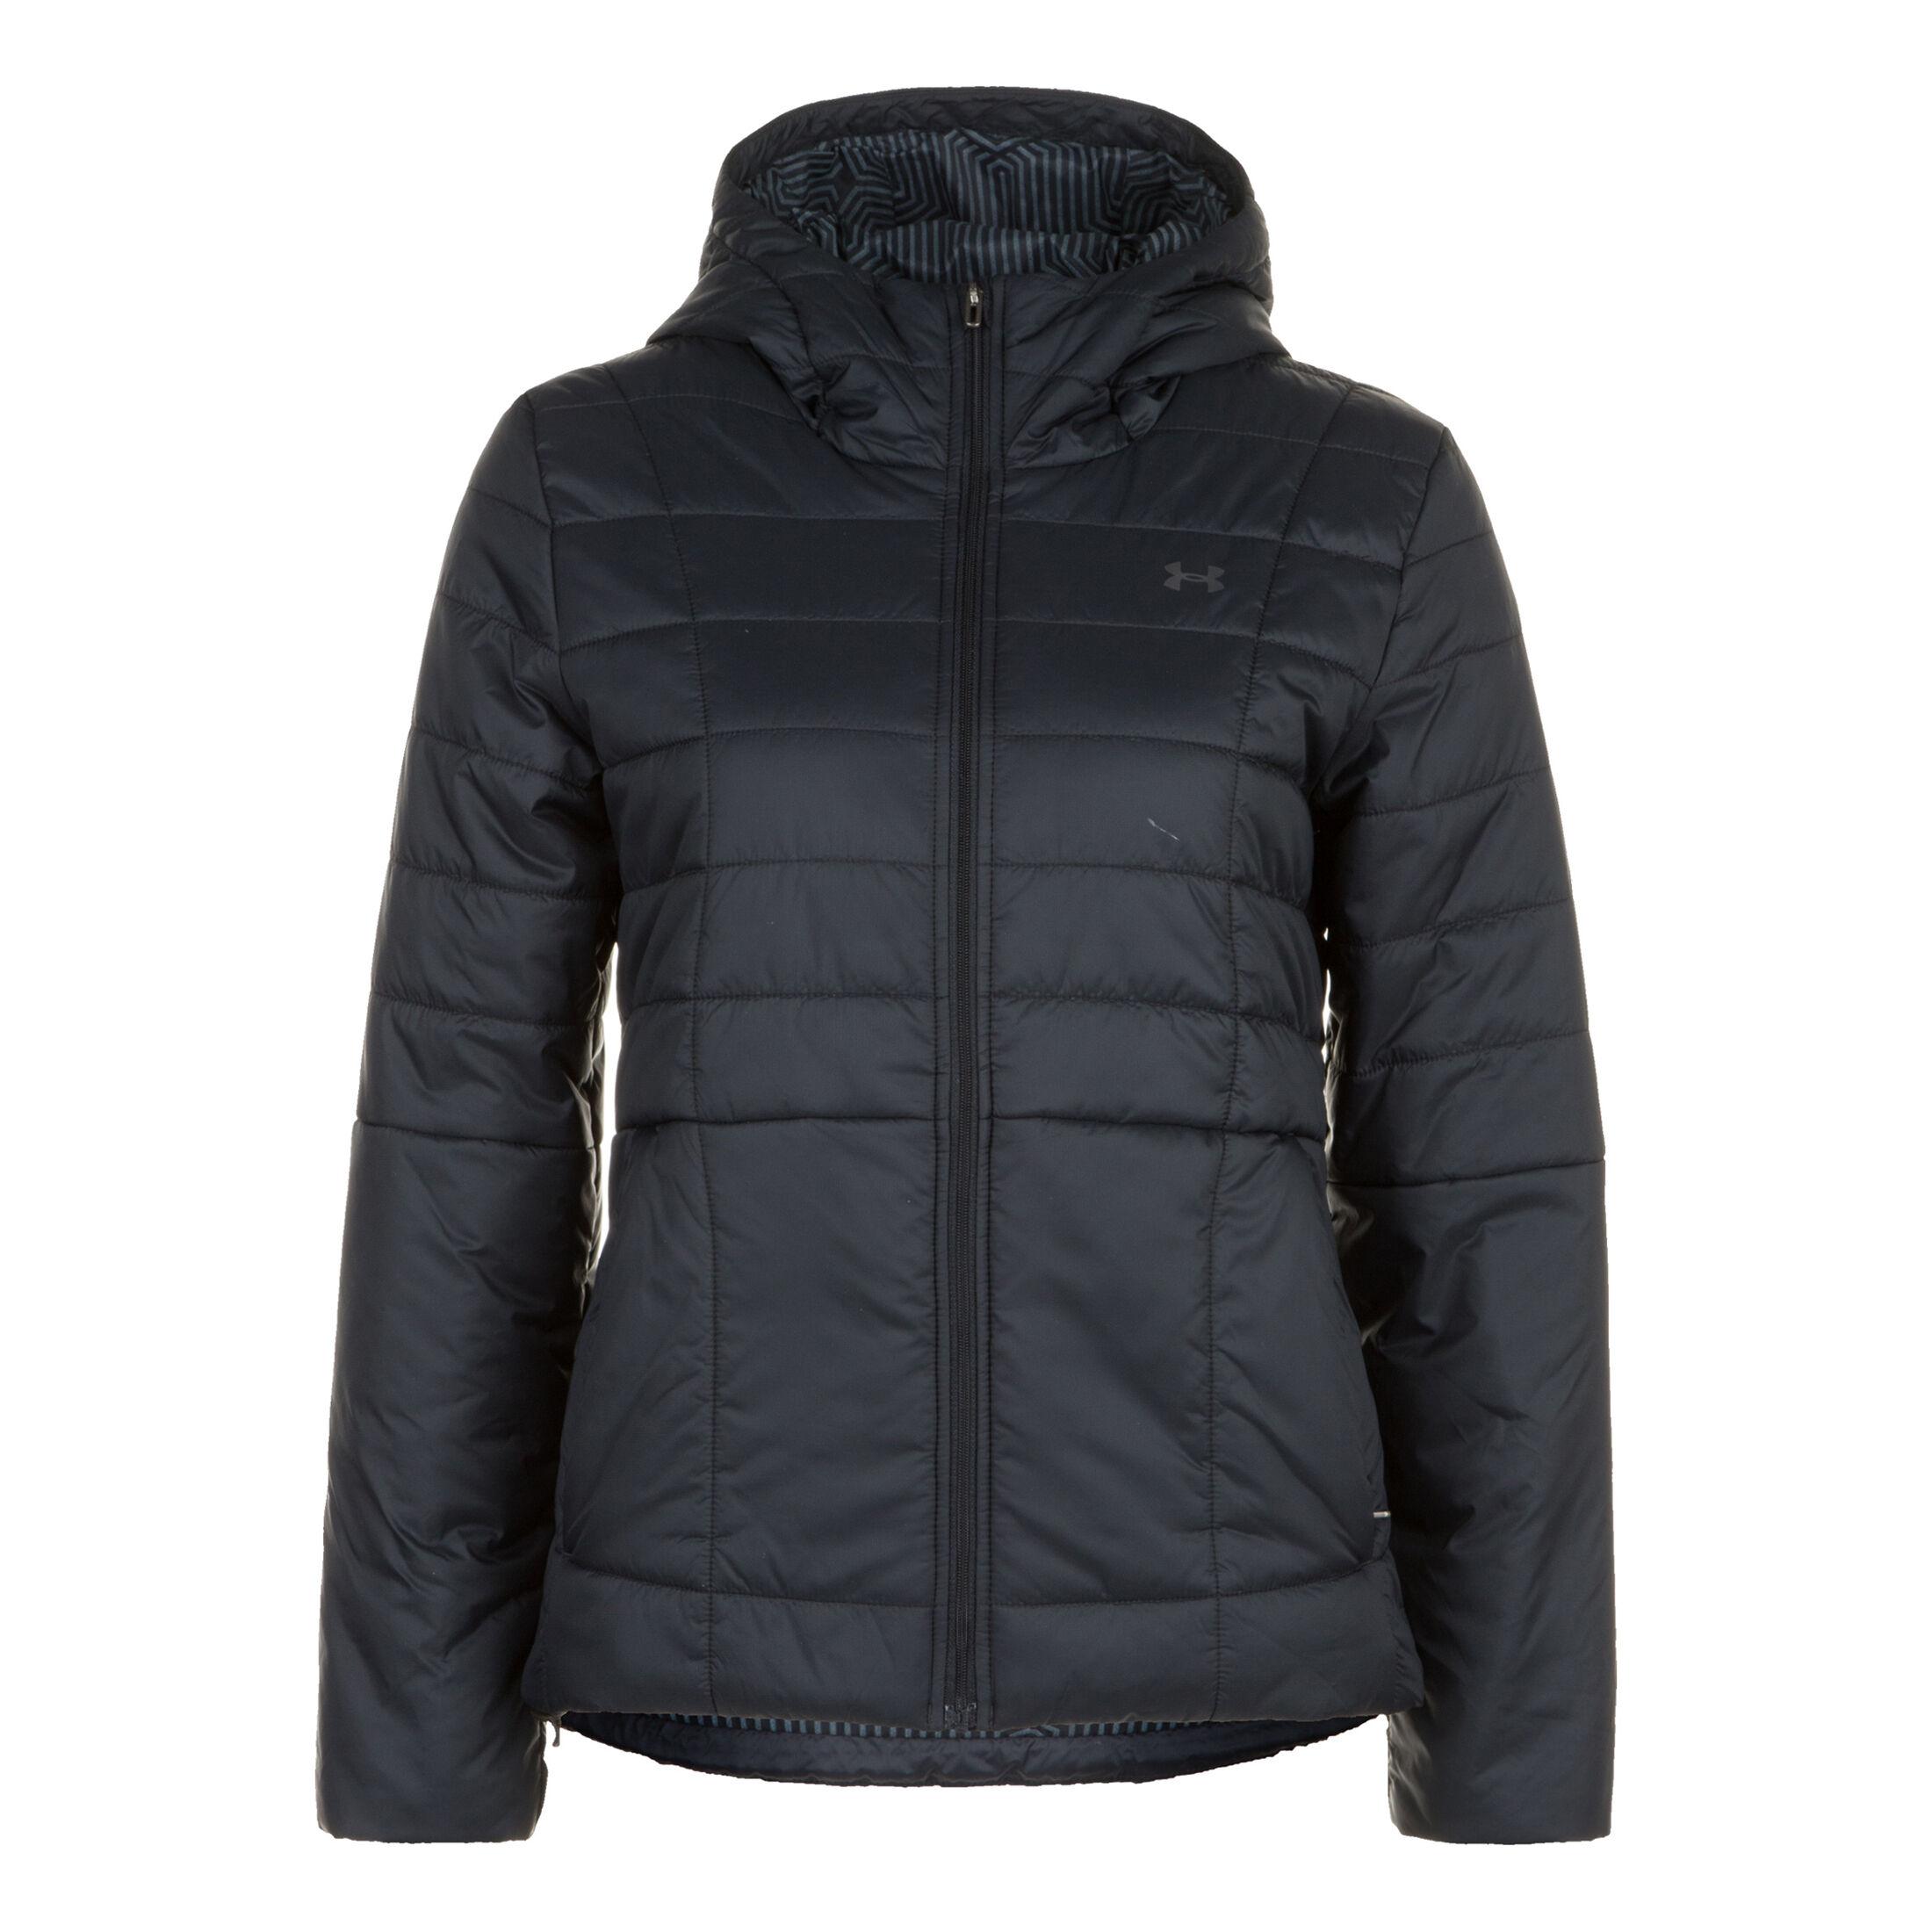 Insulated Hooded Jacke Damen